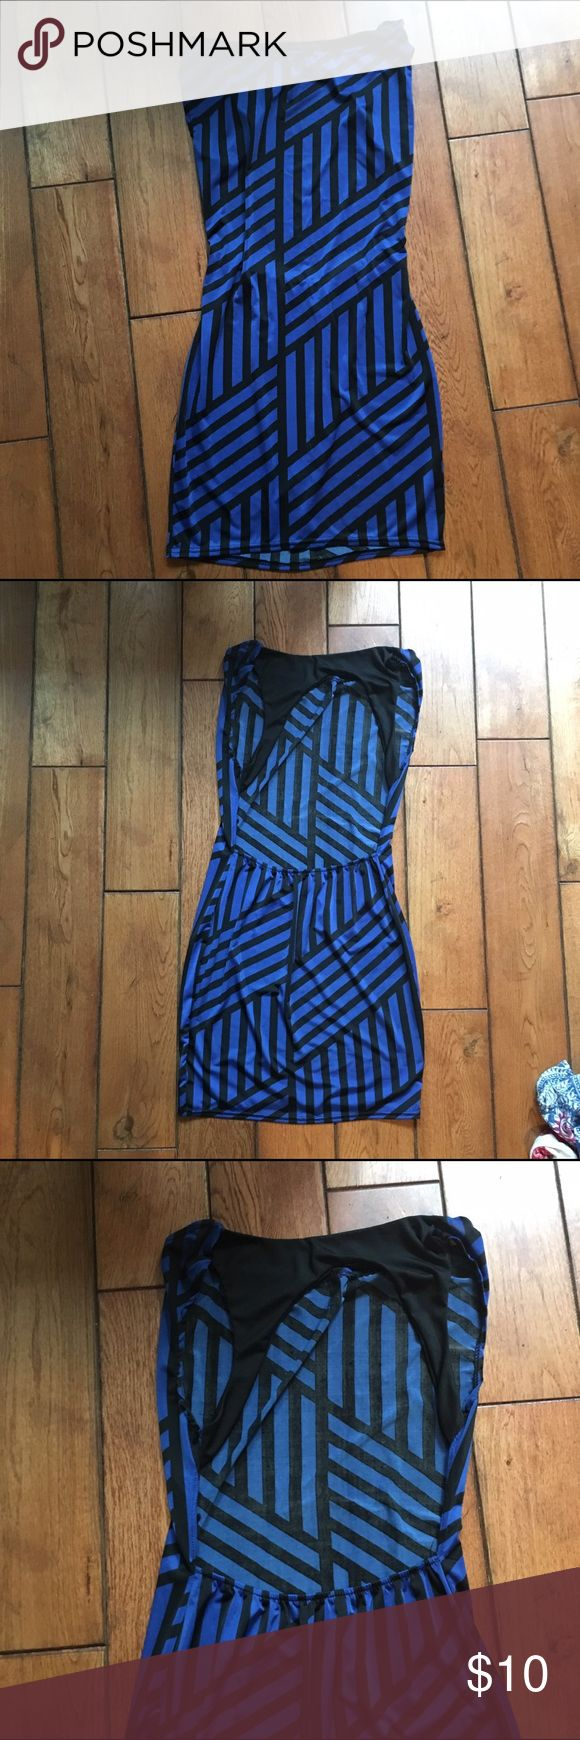 Small blue bodycon dress Missing tag Dresses Mini